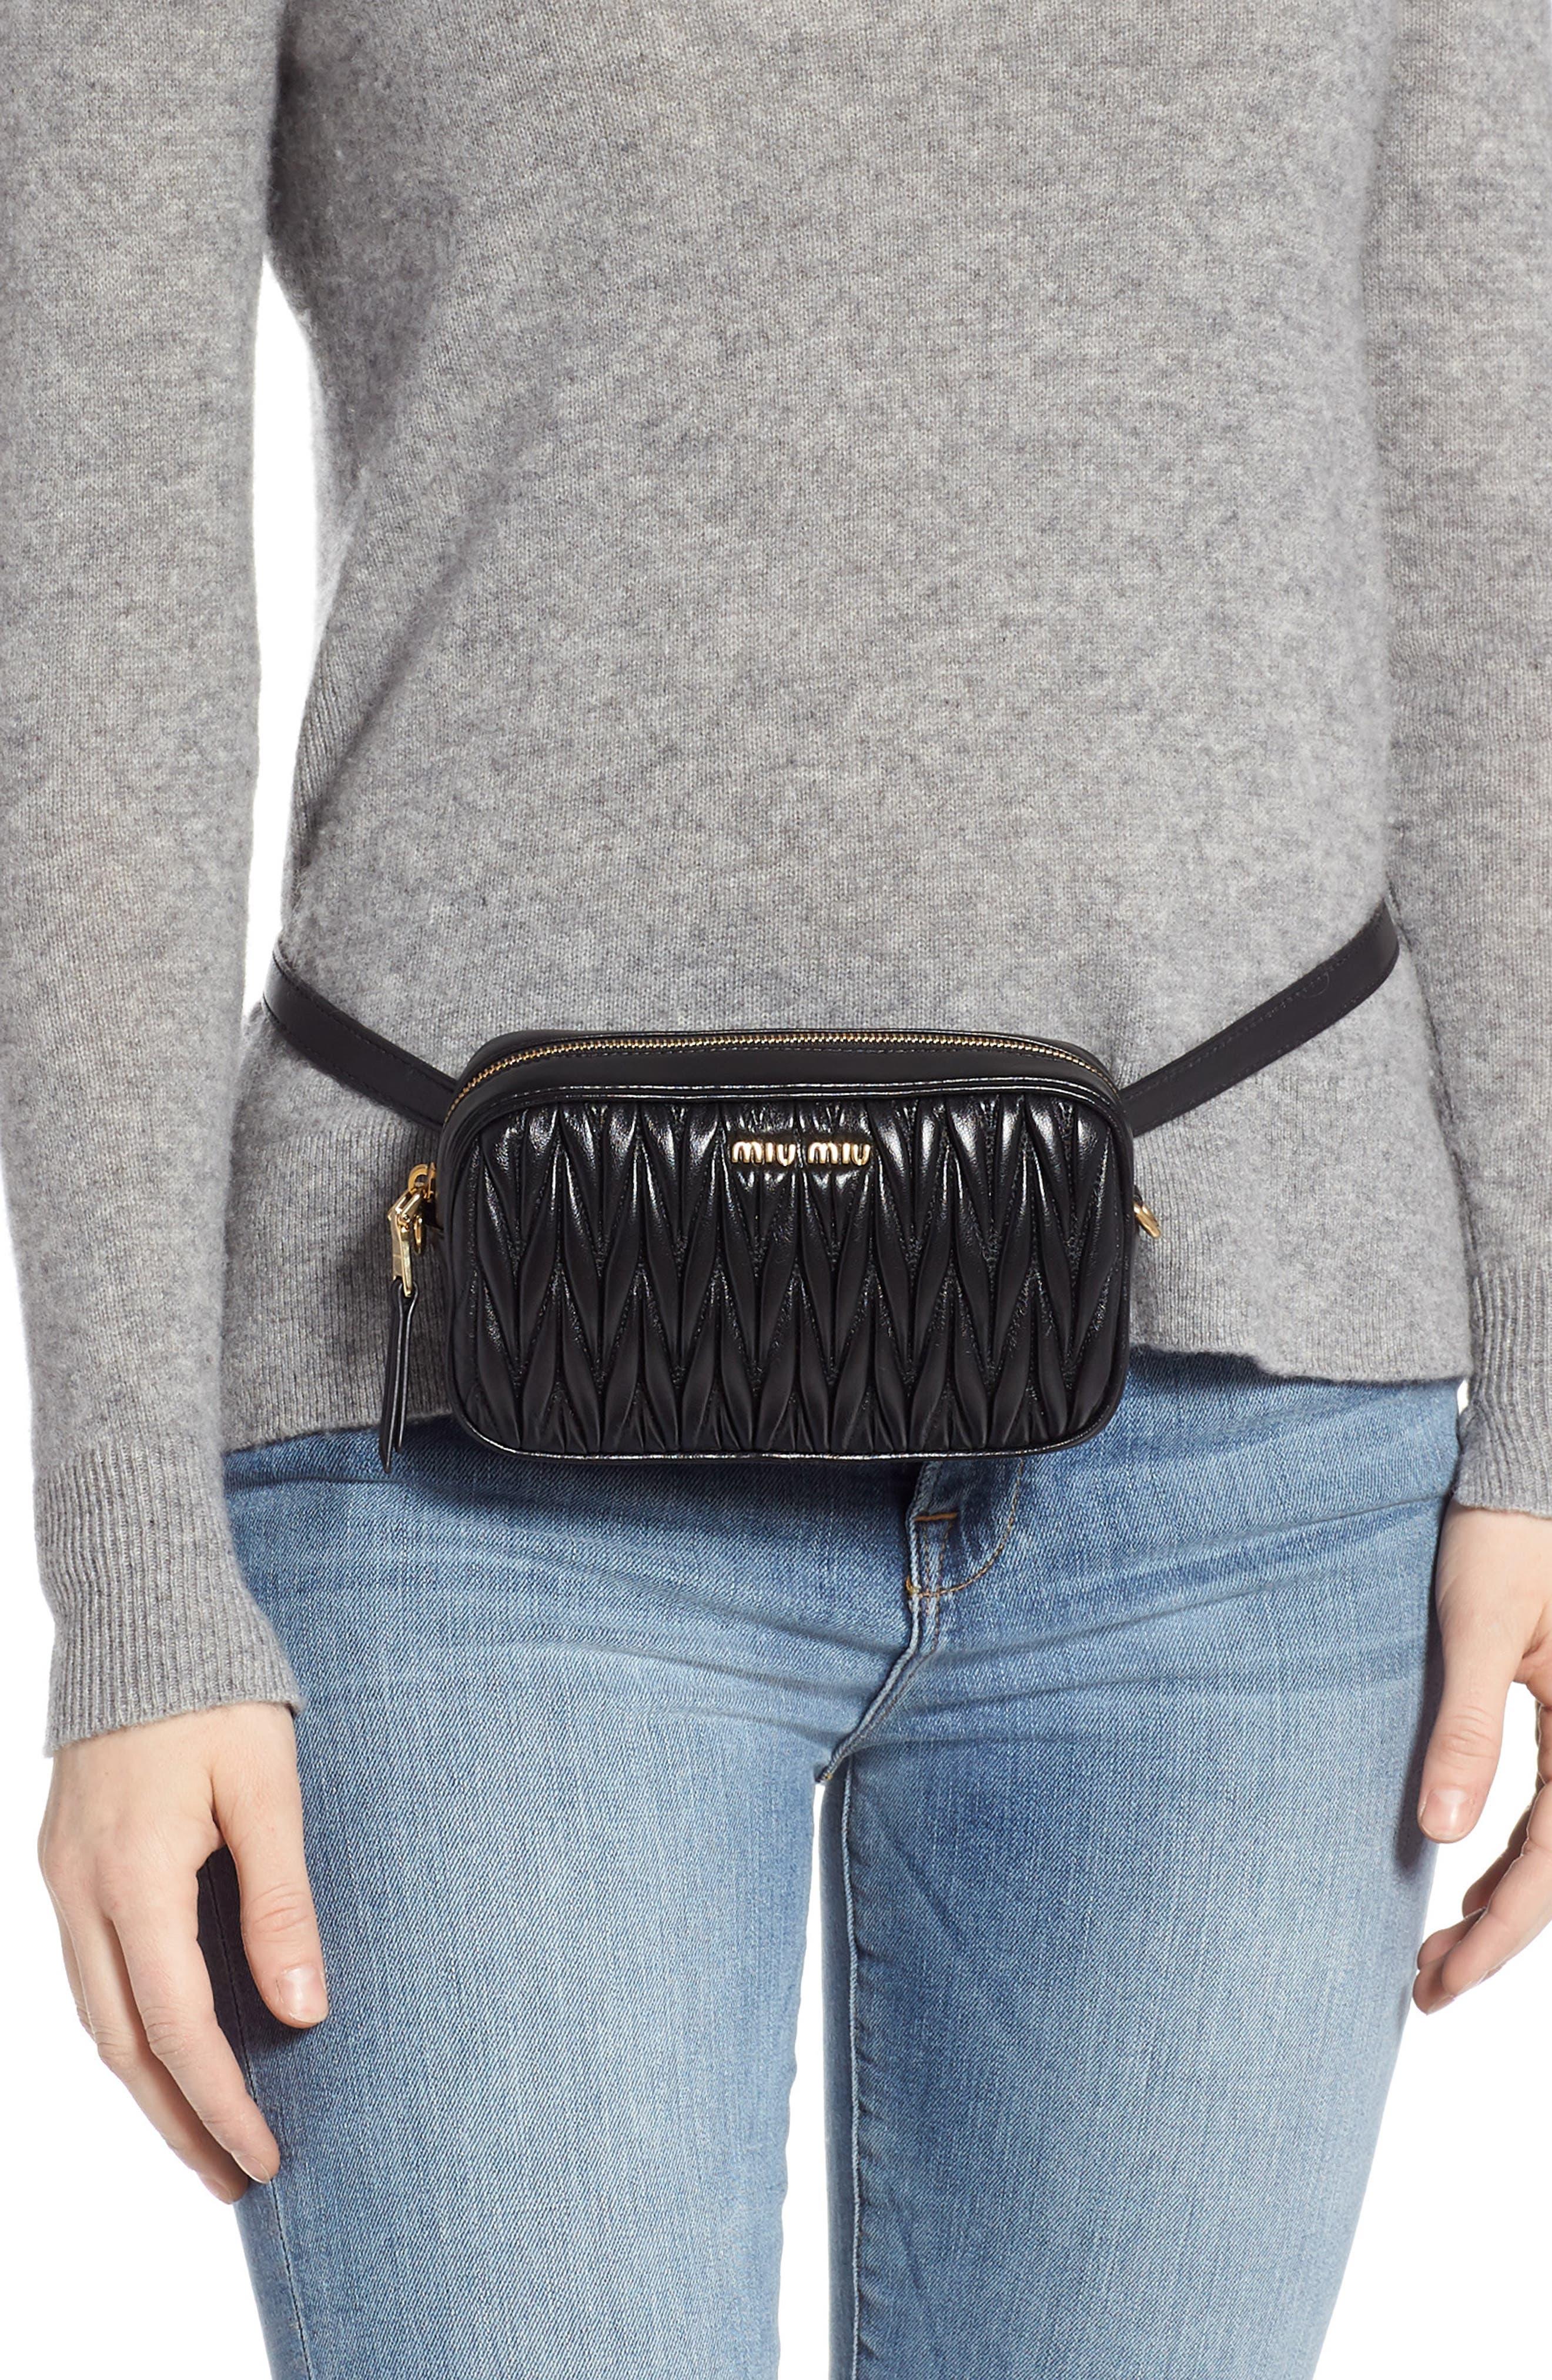 6f4b15cbb9b1 Women's Miu Miu Handbags | Nordstrom